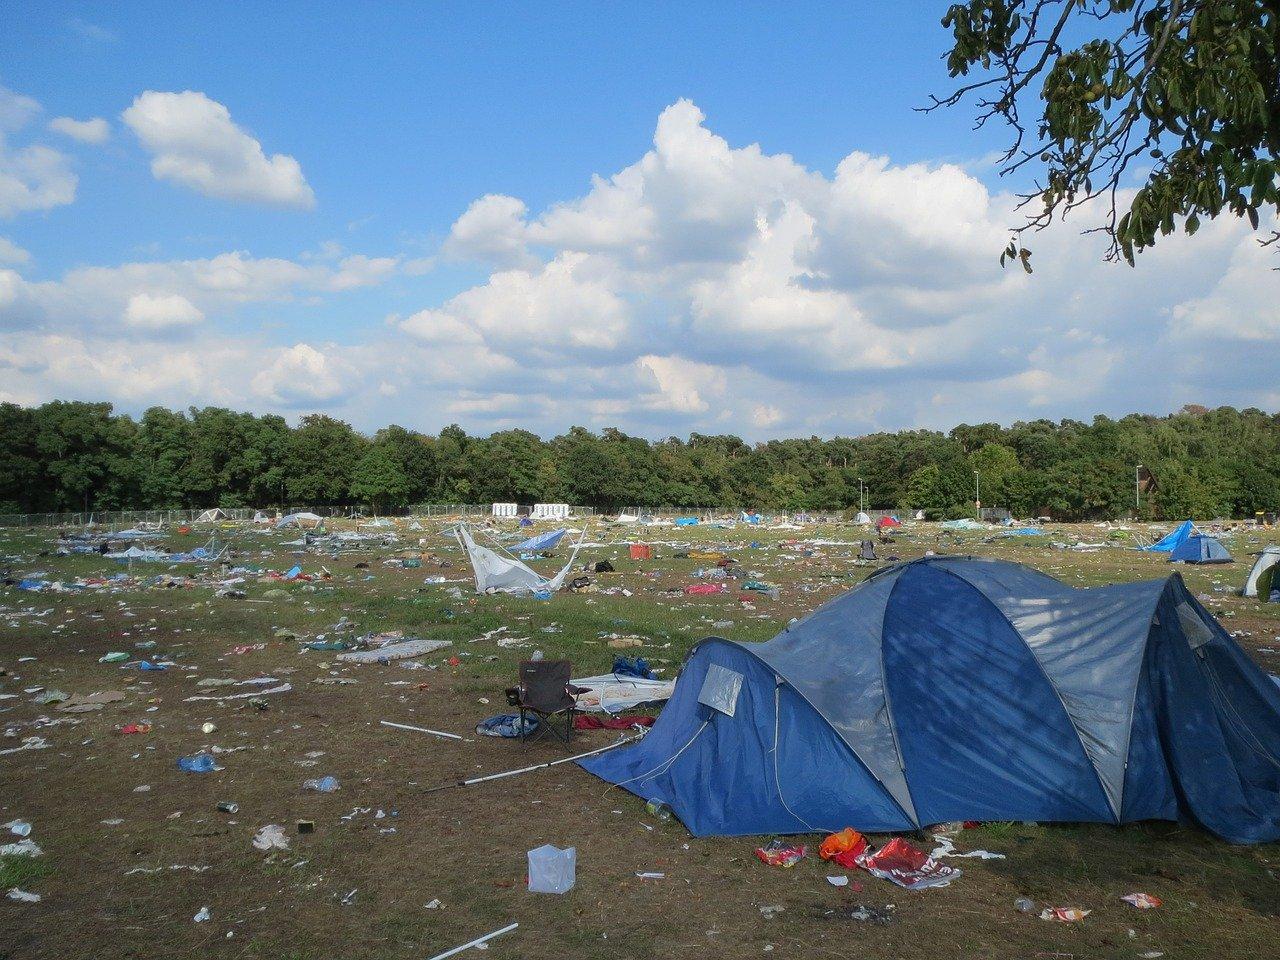 Family Camping Tips - Garbage